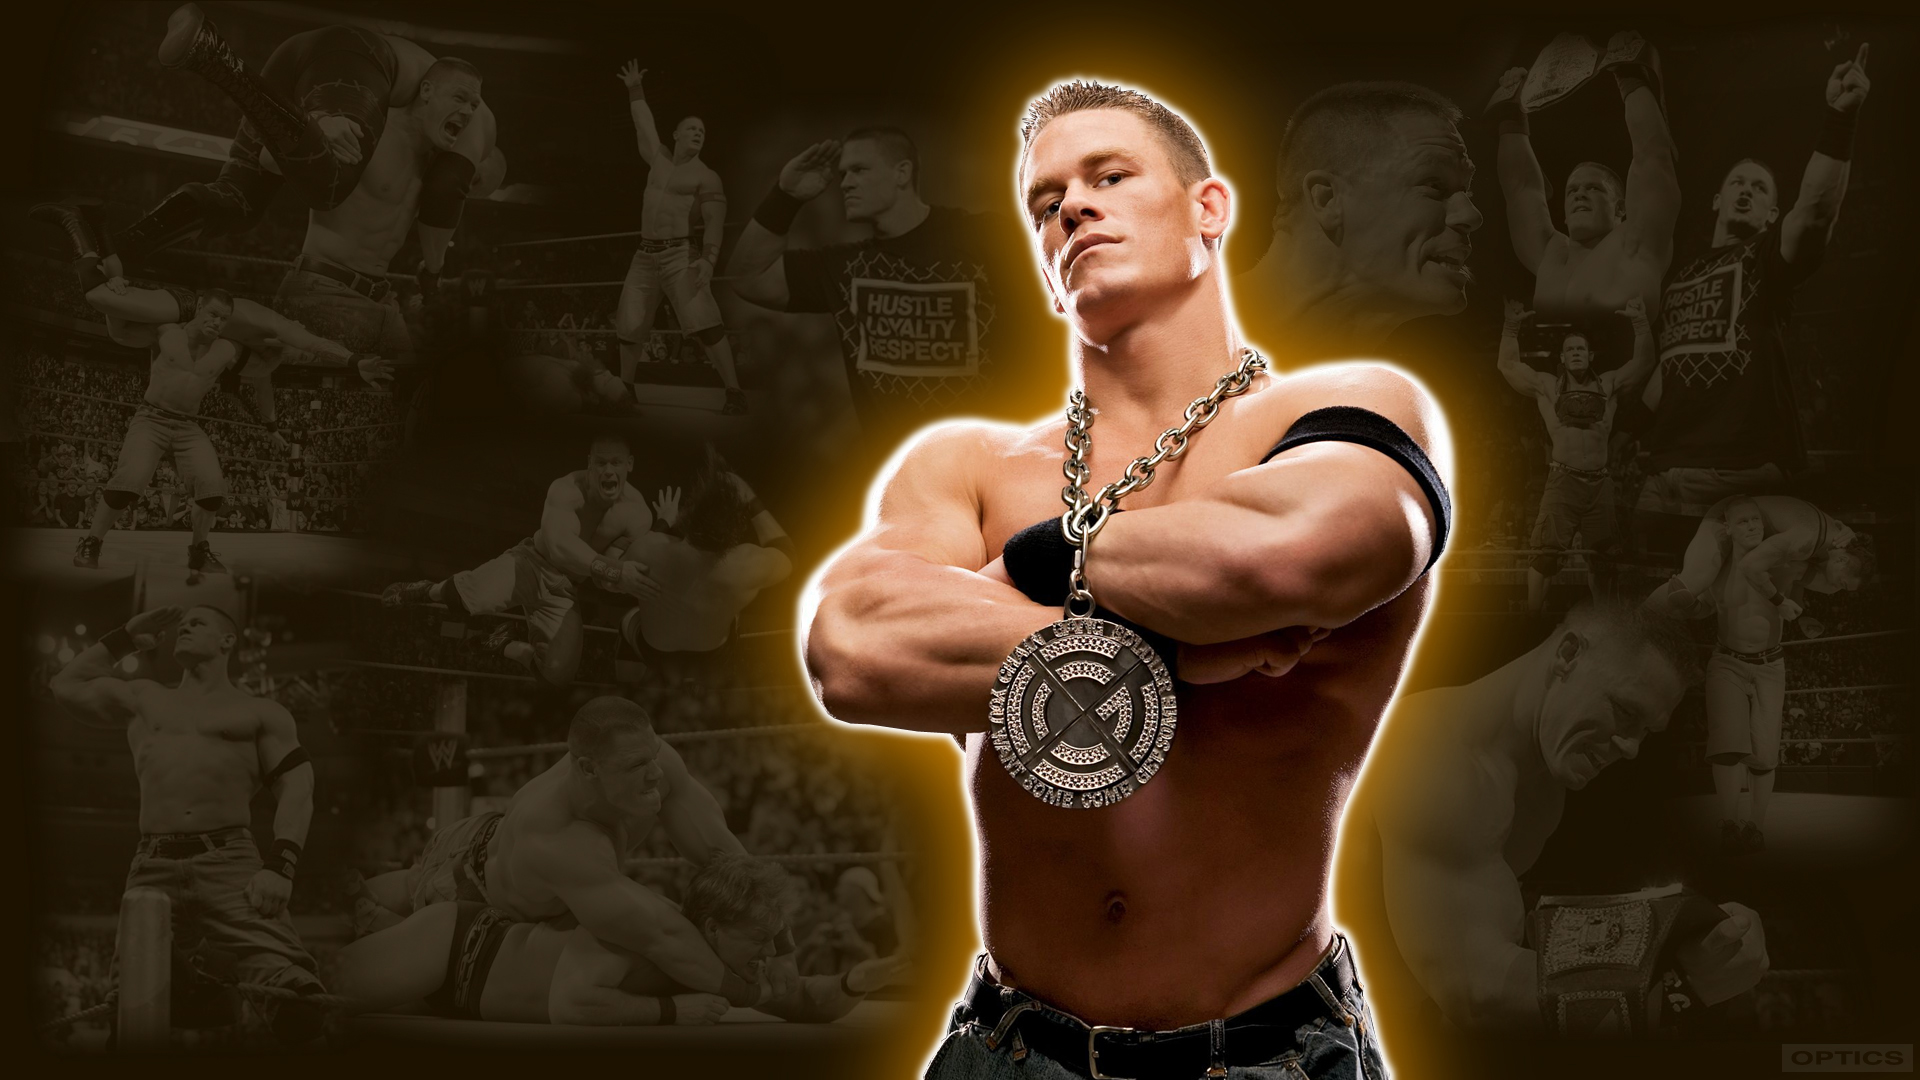 John Cena Wwe Wallpaper By 0pt1c5 On Deviantart